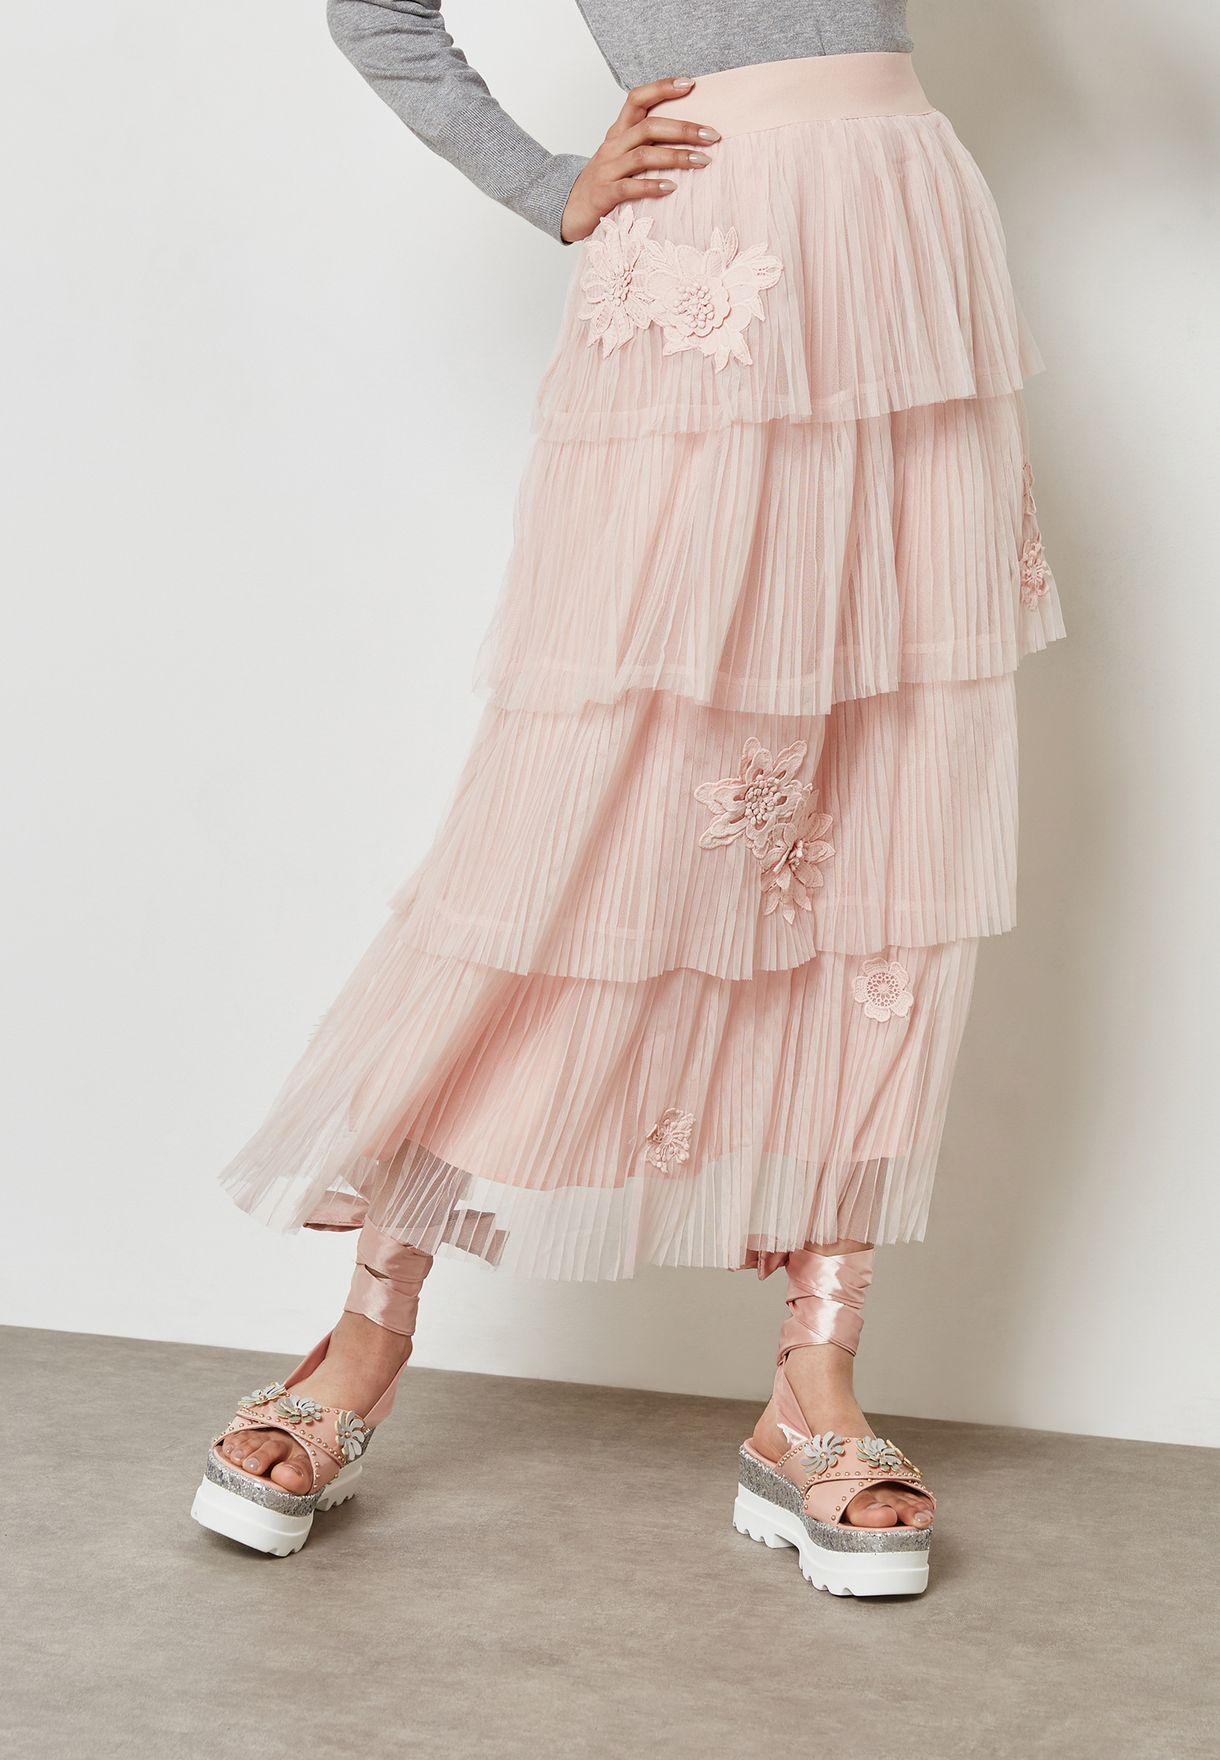 5de9693c1 Shop Anotah pink Flower Applique Tiered Pleated Skirt 18SSSKI ...